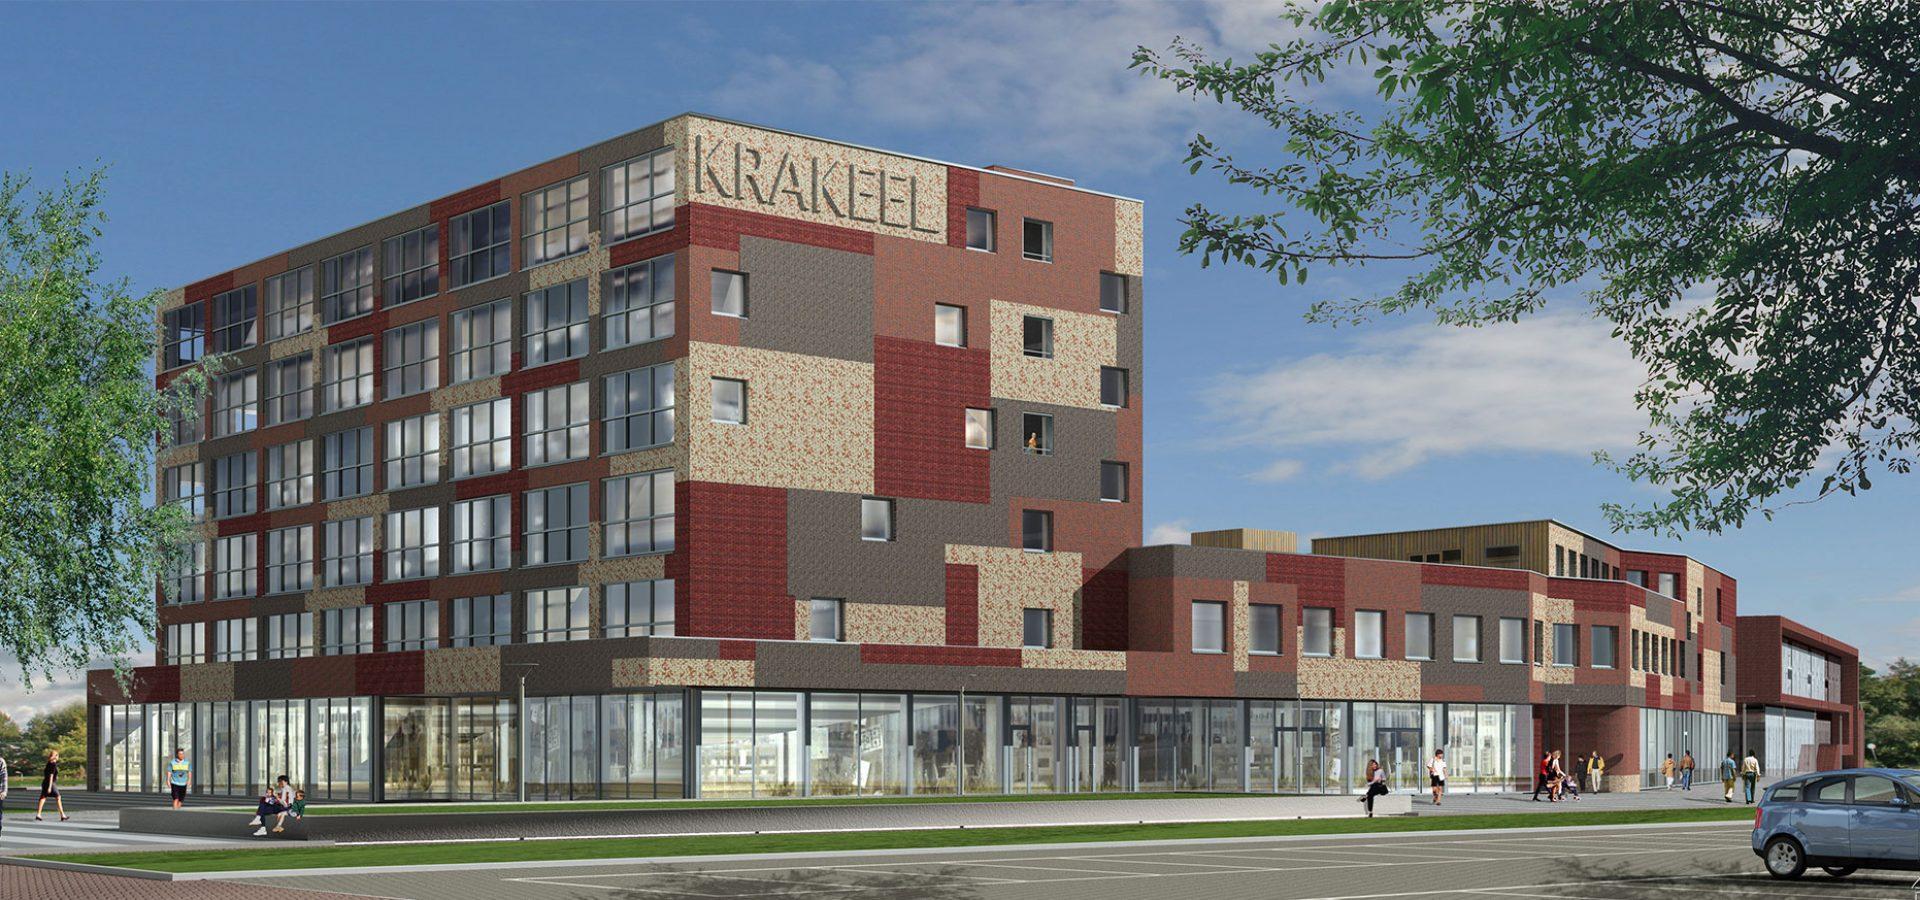 FARO architecten woon-servicegebouw Krakeel 01